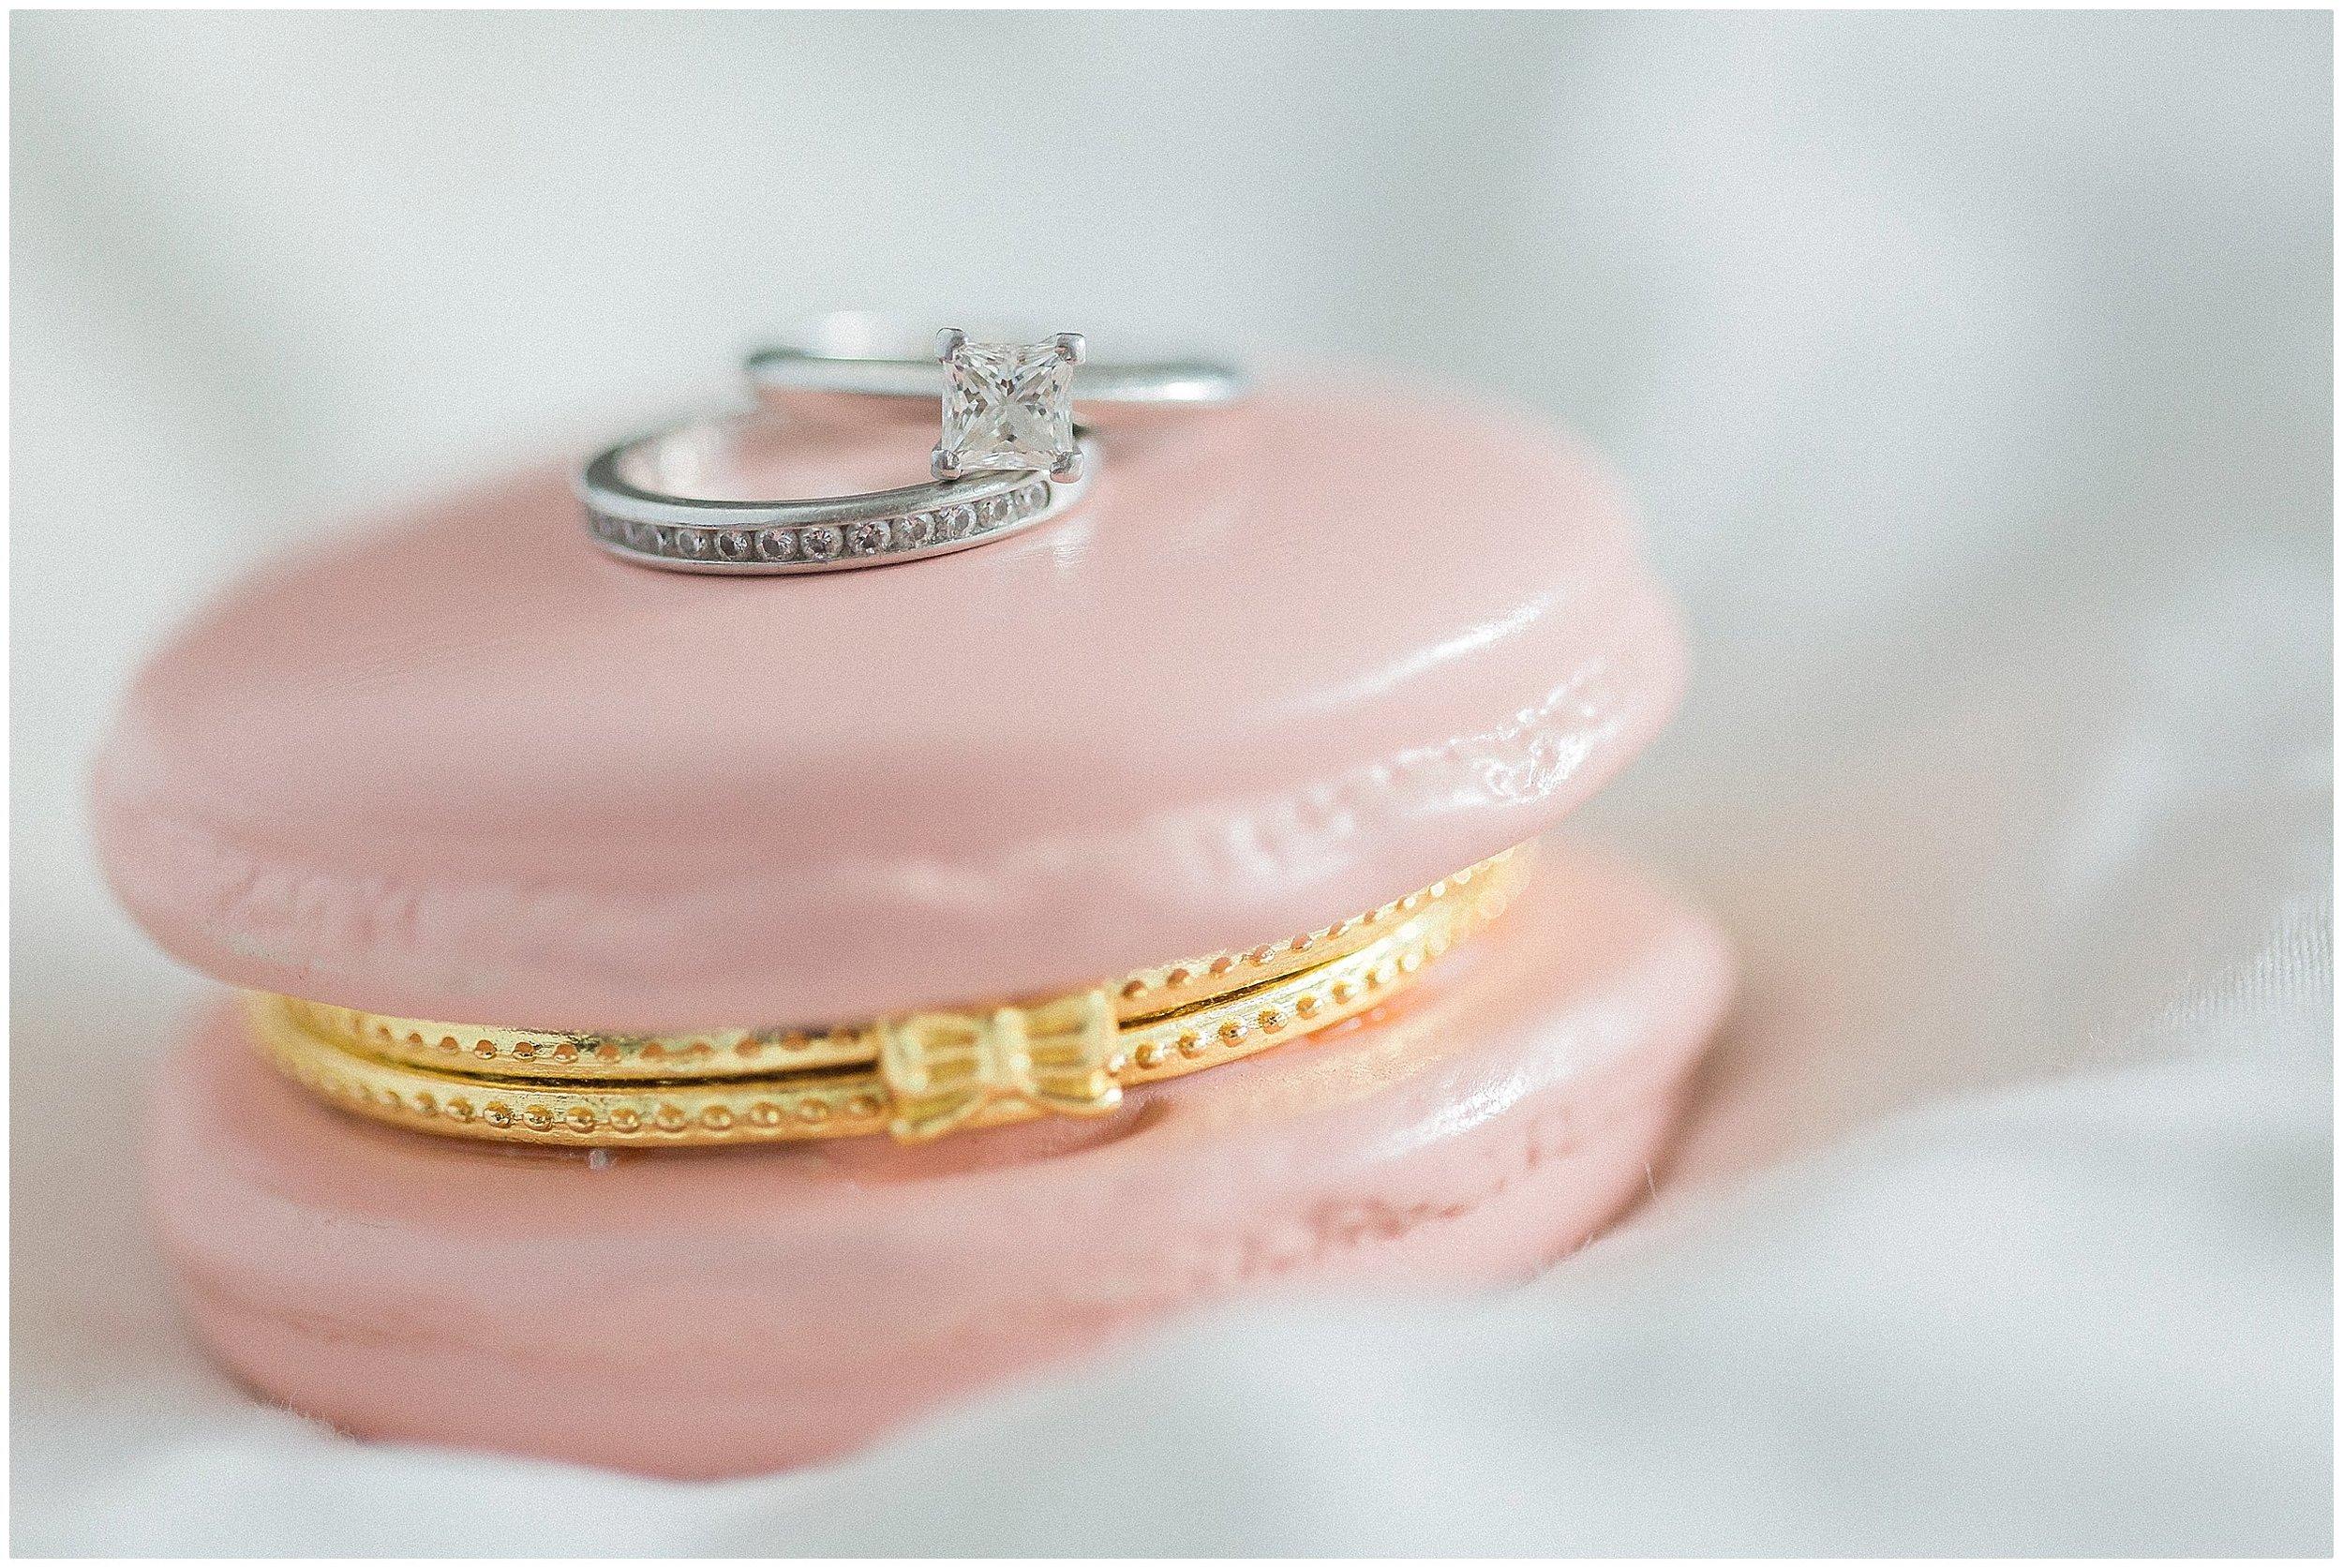 Macaroon trinket holder with princess cut diamond and channel wedding band